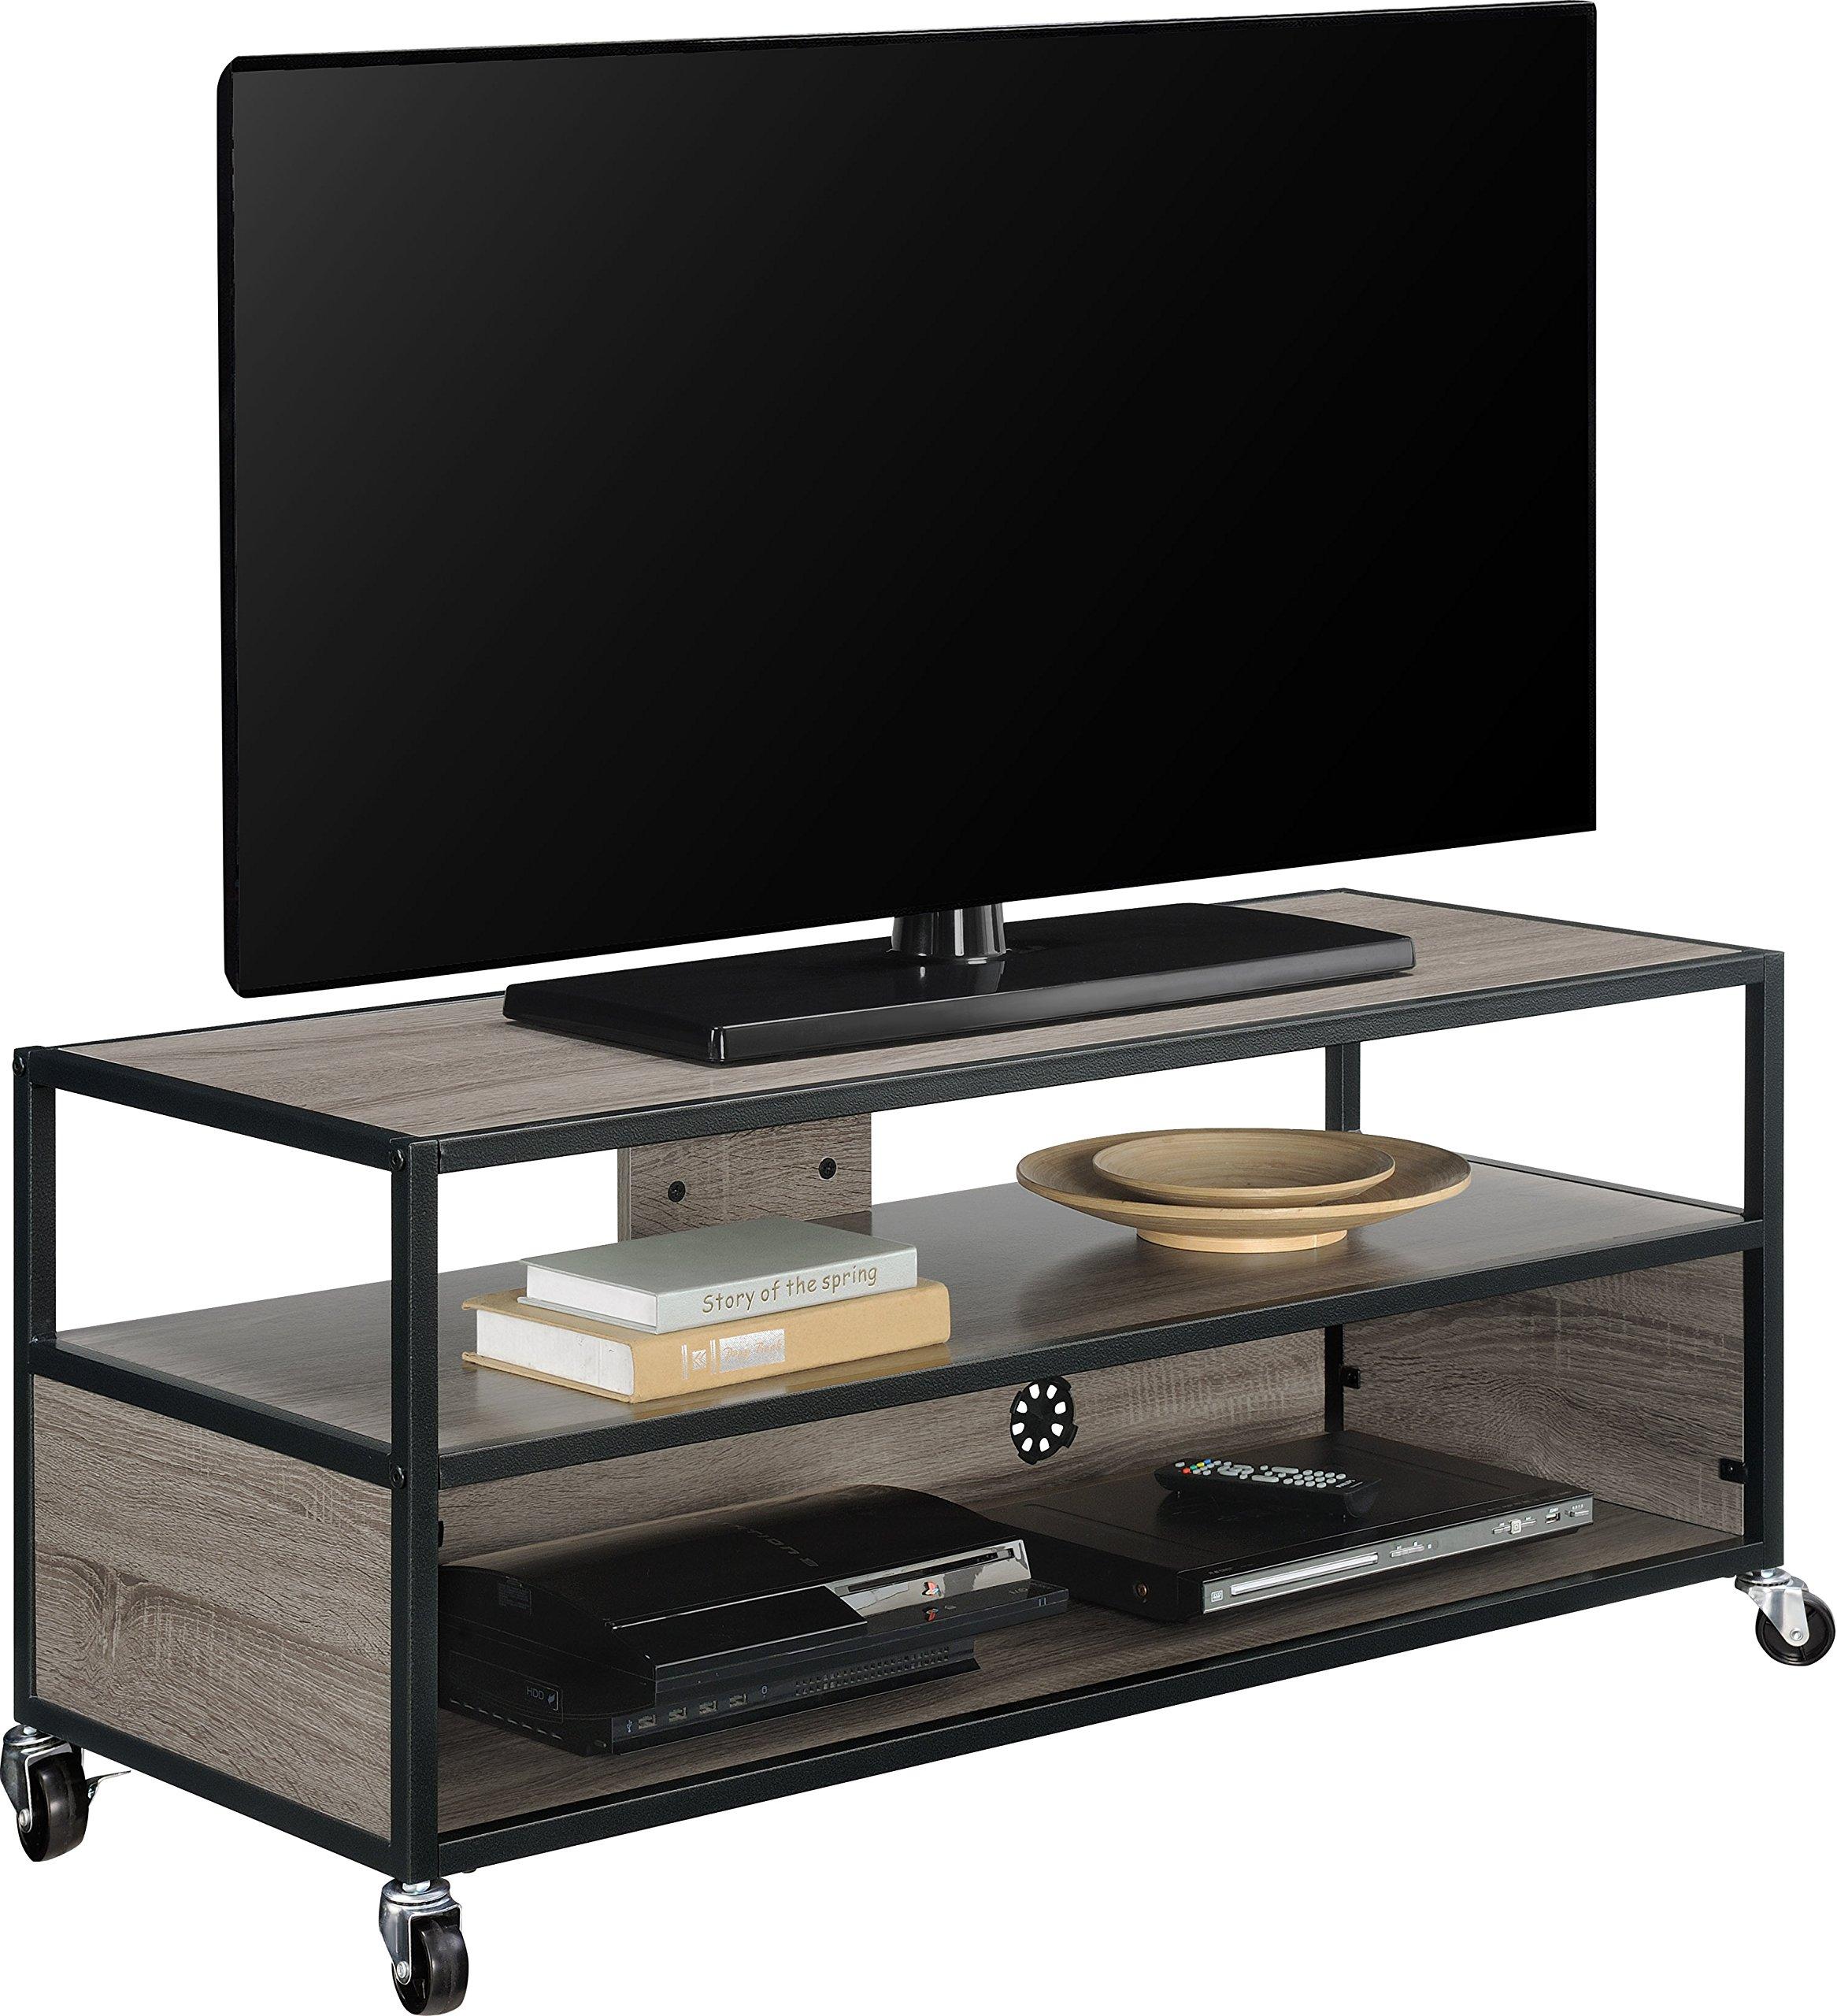 Altra Mason Ridge Mobile 46'' TV Stand with Metal Frame, Sonoma Oak/Black by Altra Furniture (Image #9)